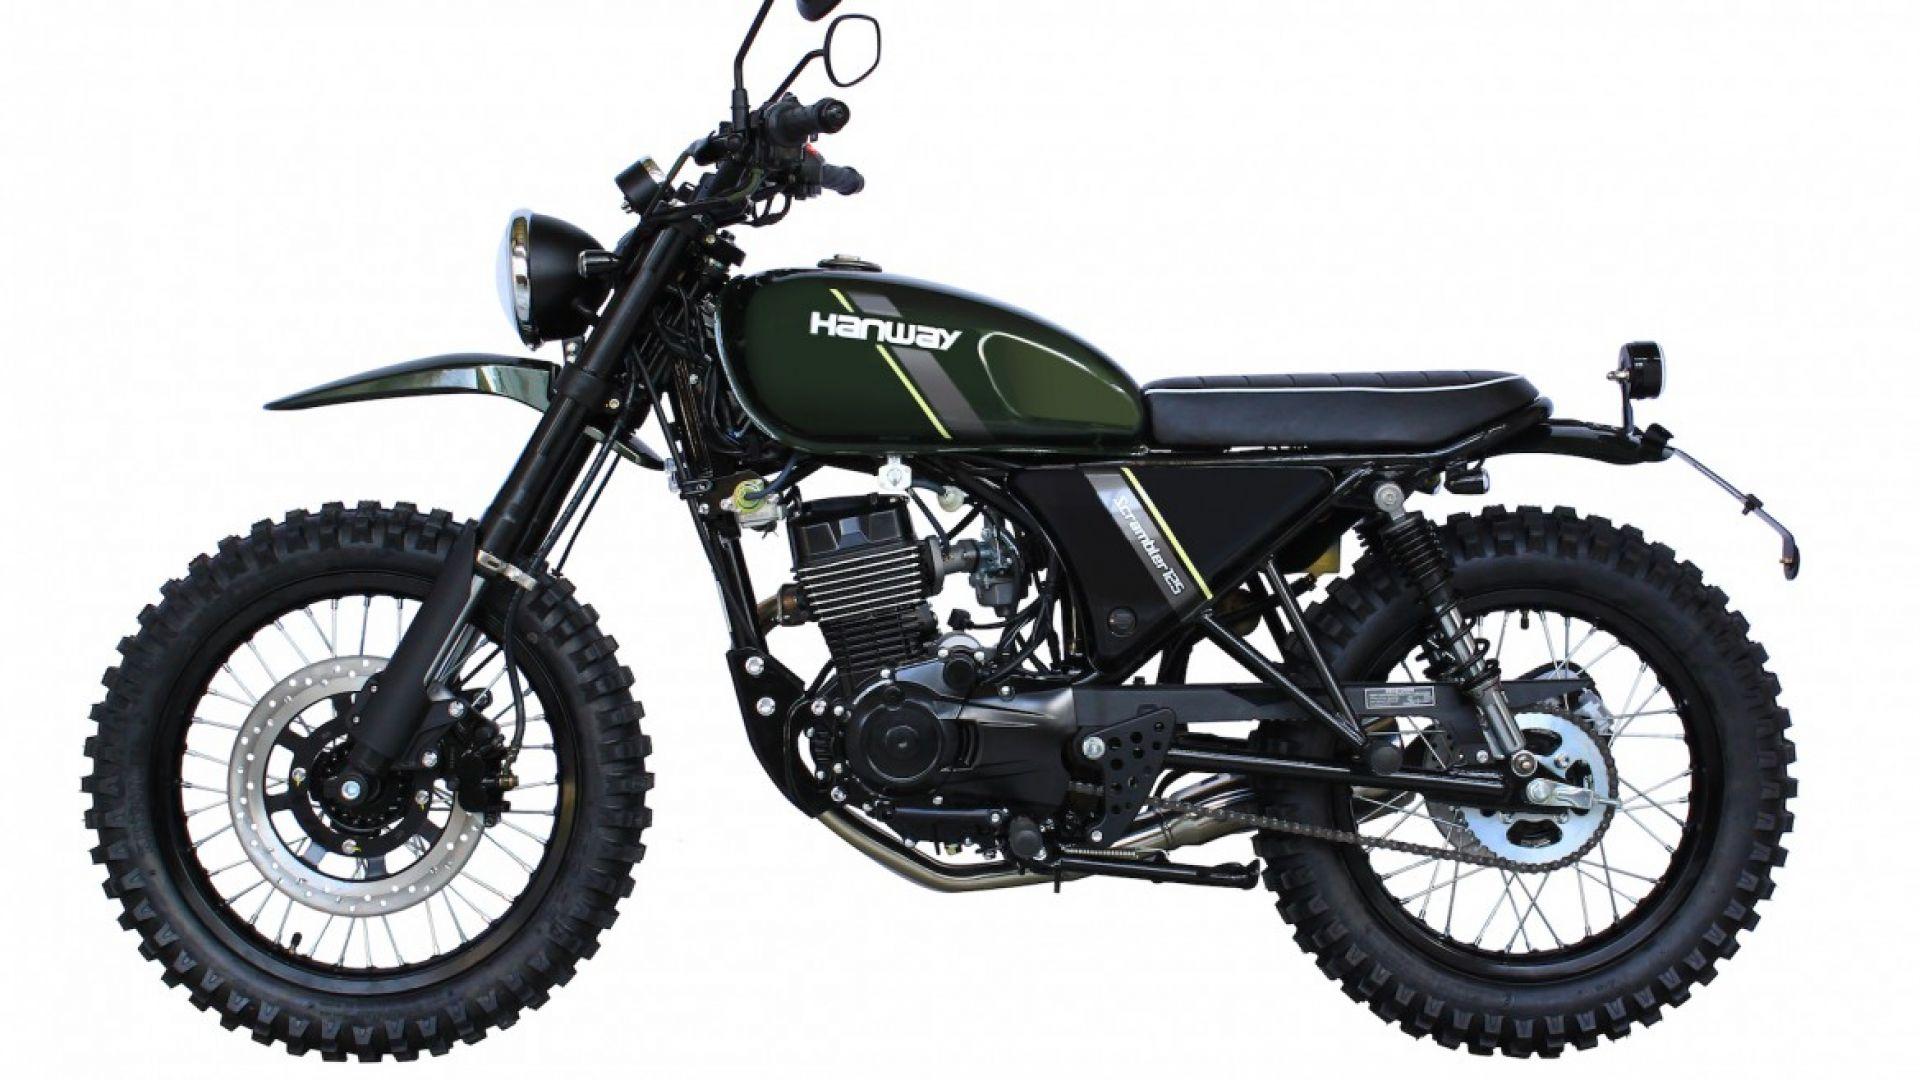 novit moto hanway 125 scrambler low cost da euro motorbox. Black Bedroom Furniture Sets. Home Design Ideas